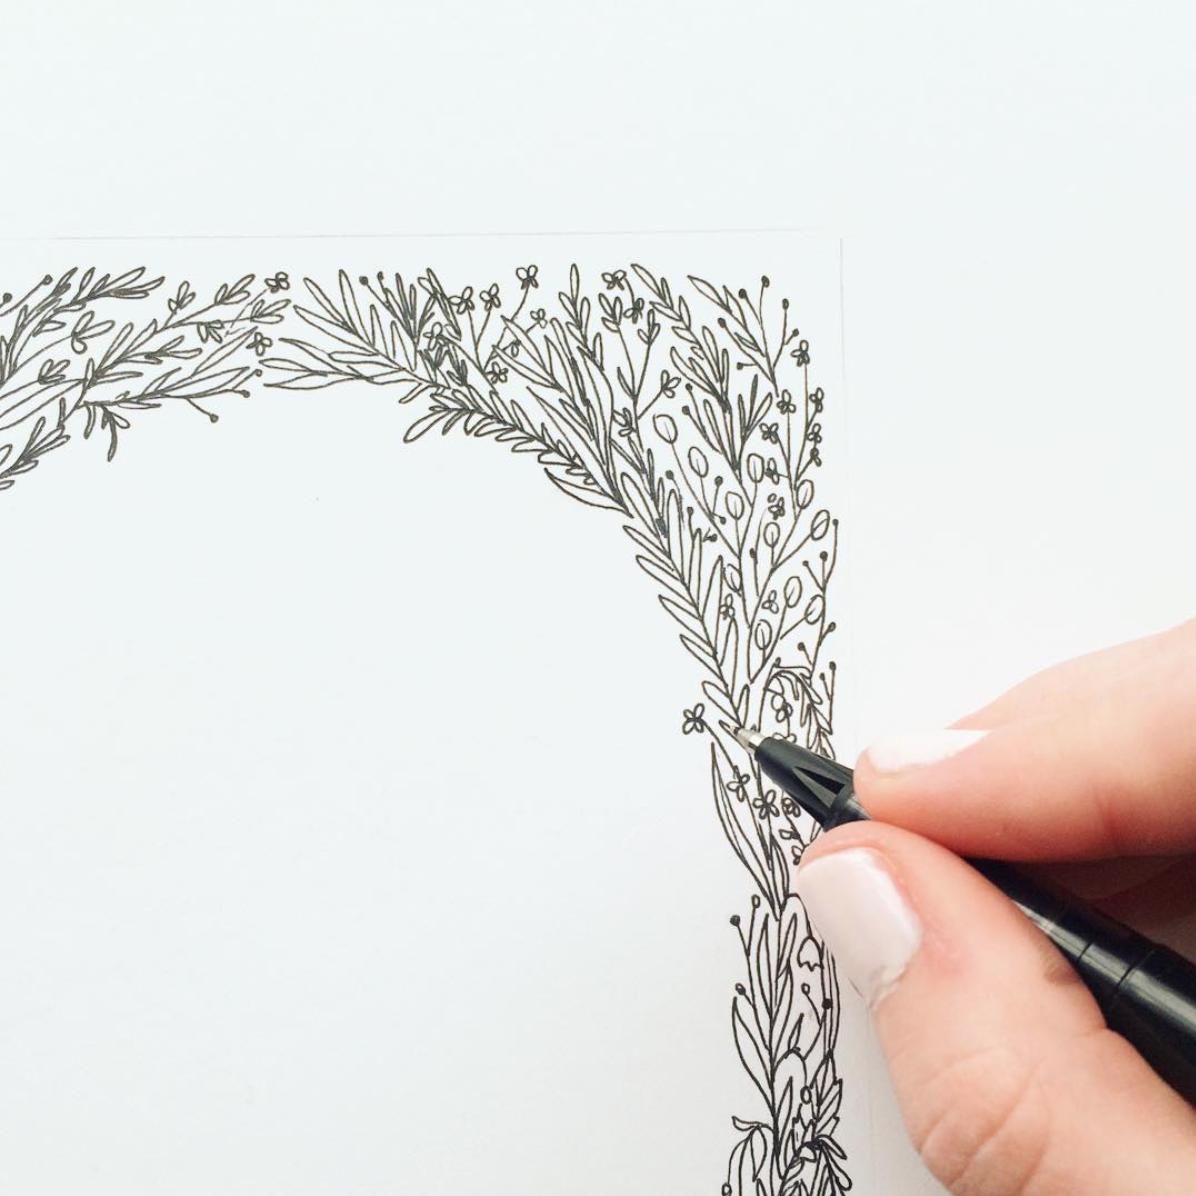 A custom floral border sketch for an invitation.